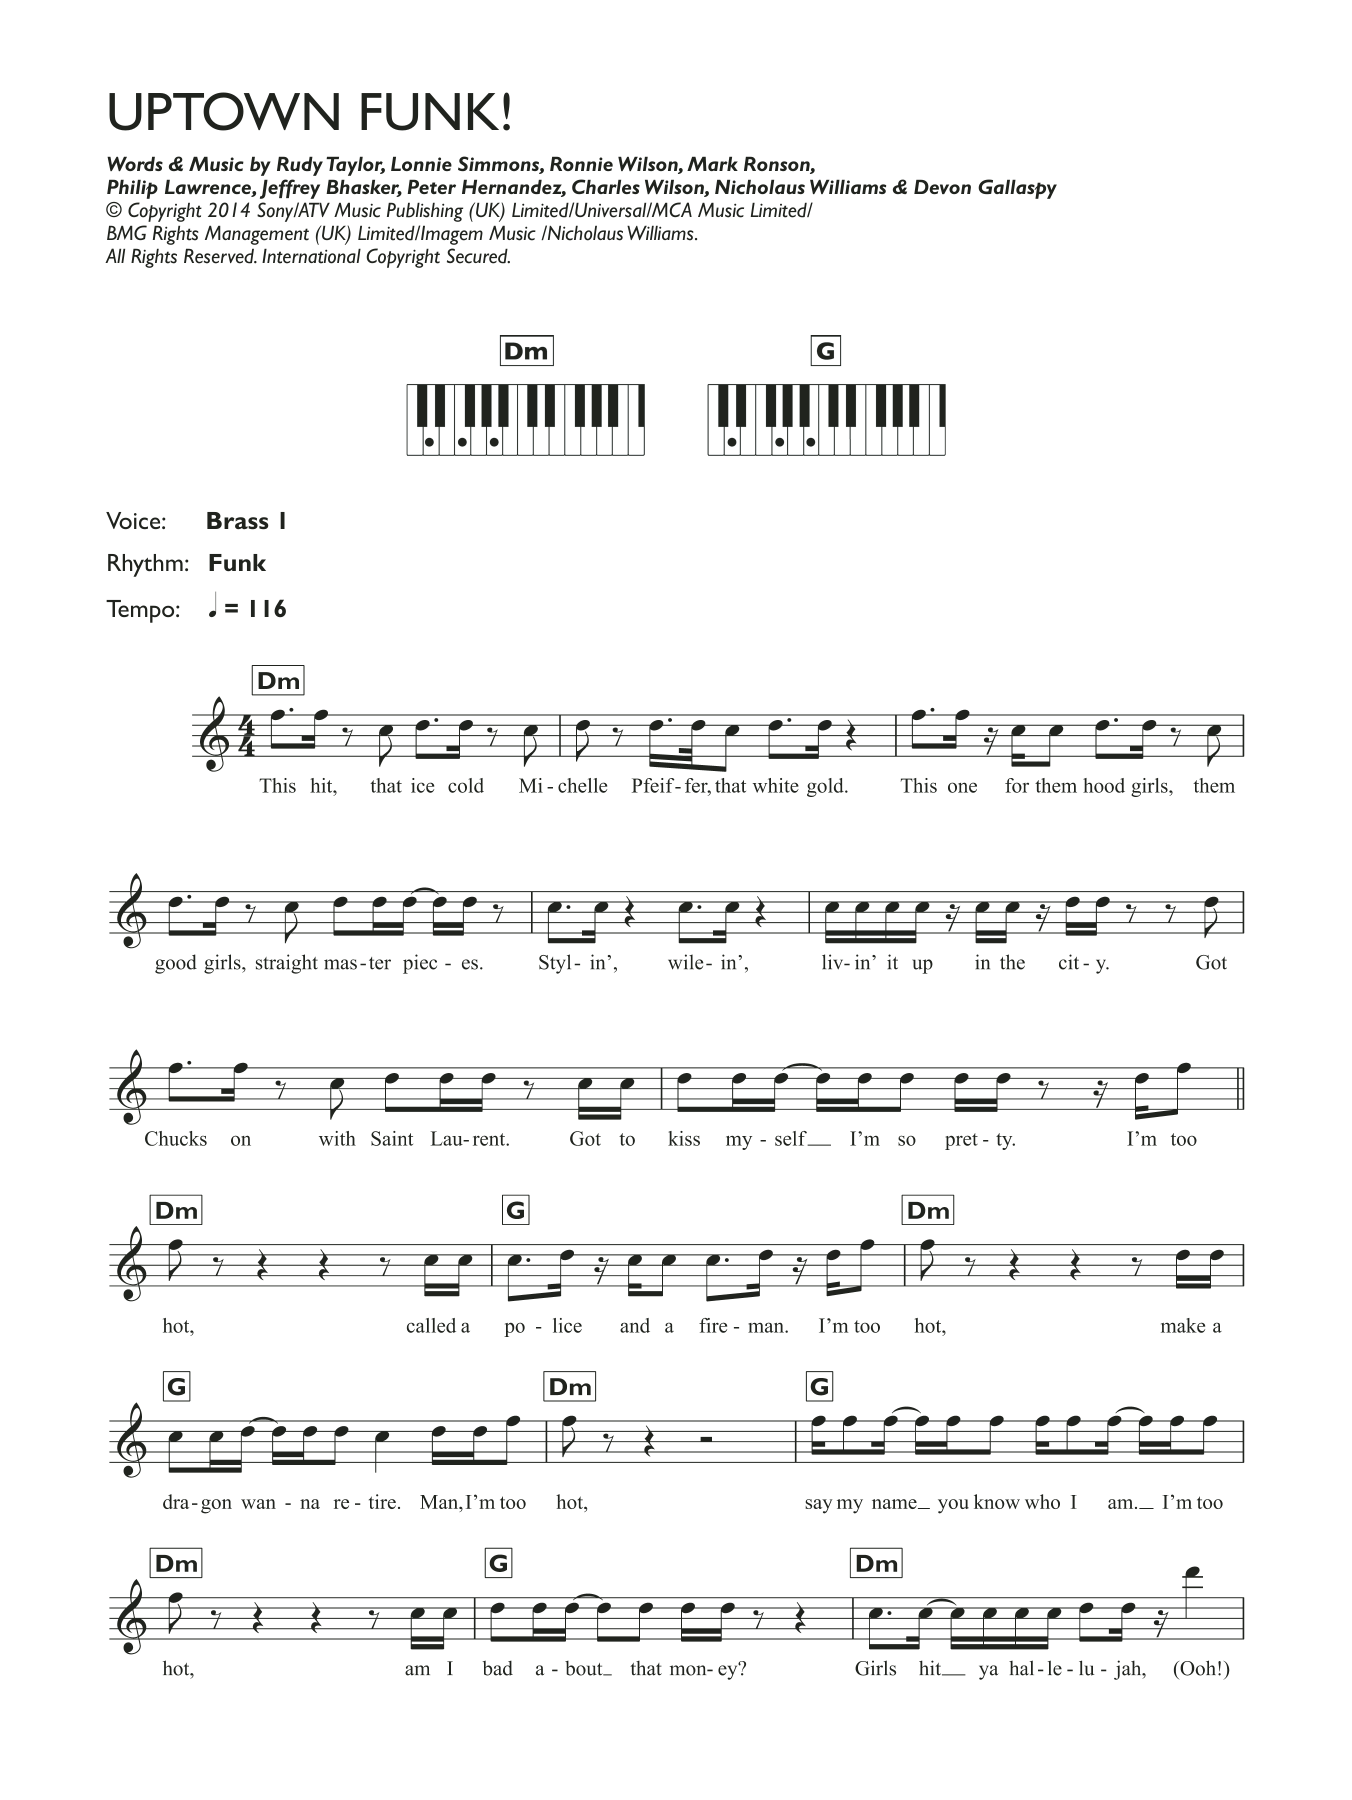 Mark Ronson - Uptown Funk (featuring Bruno Mars)